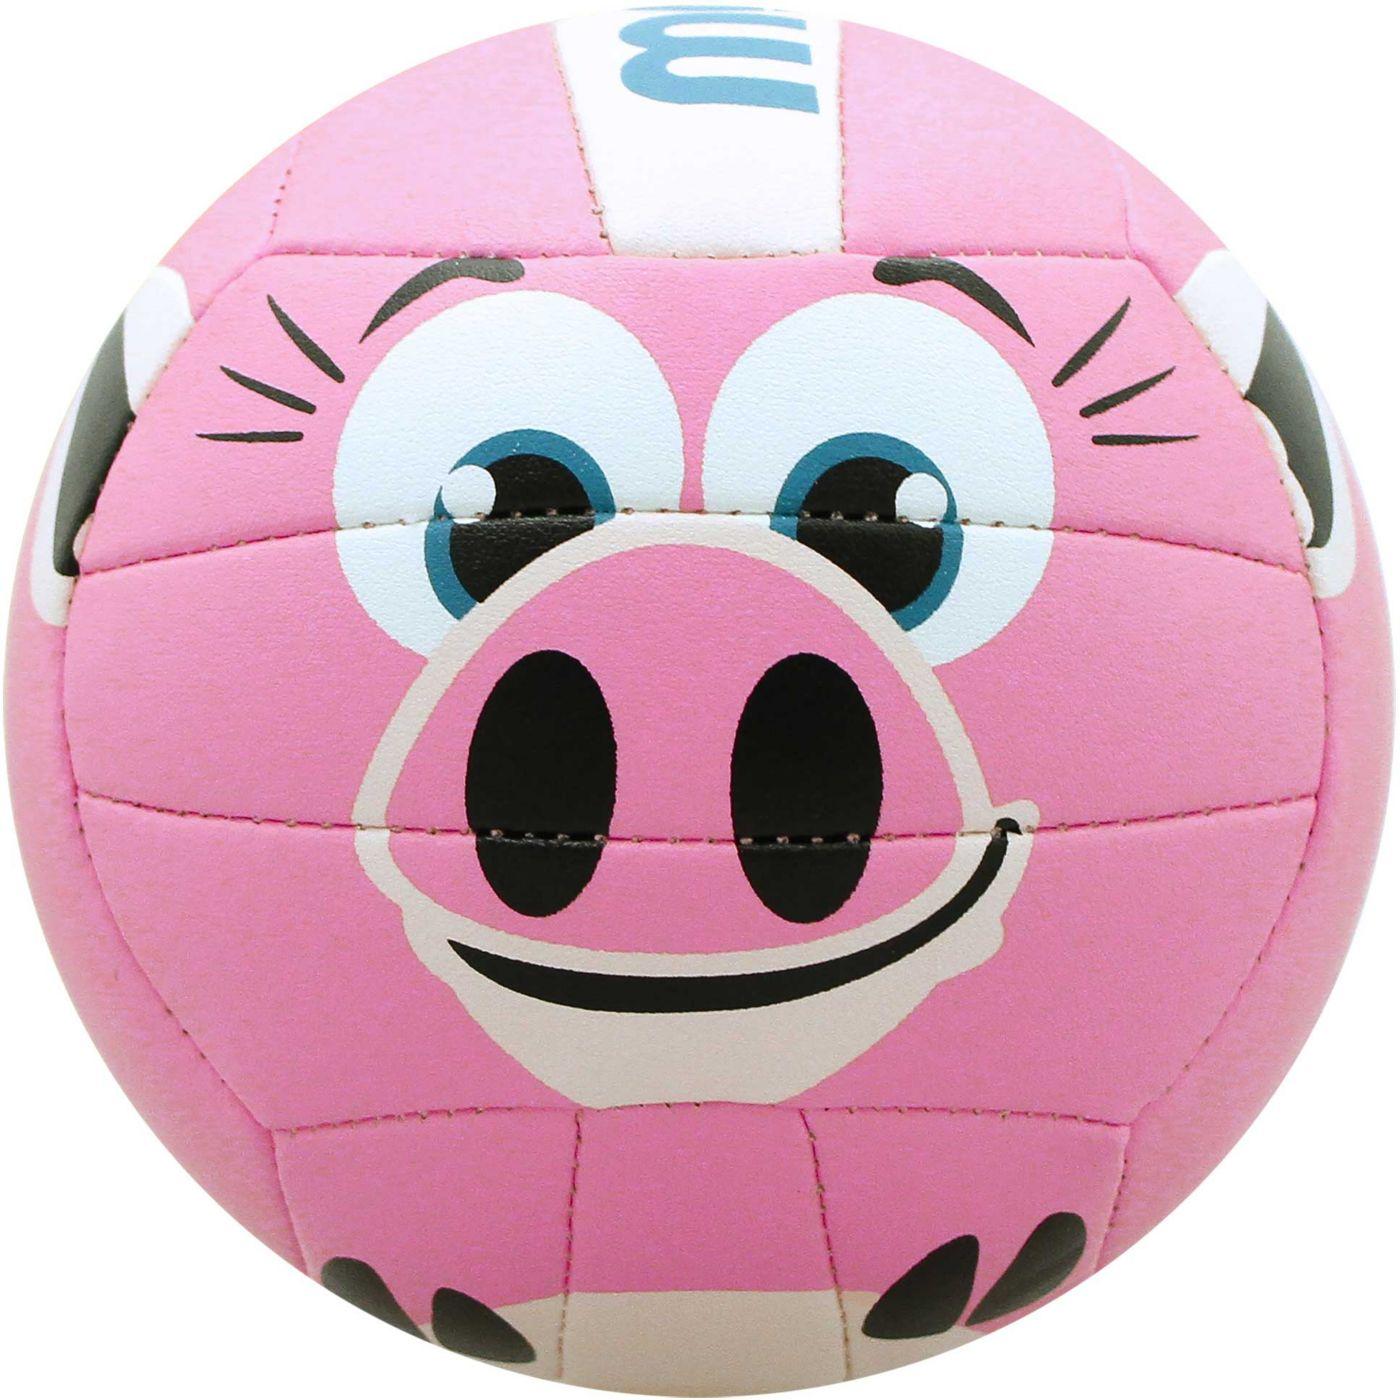 Molten Mini Volleyball